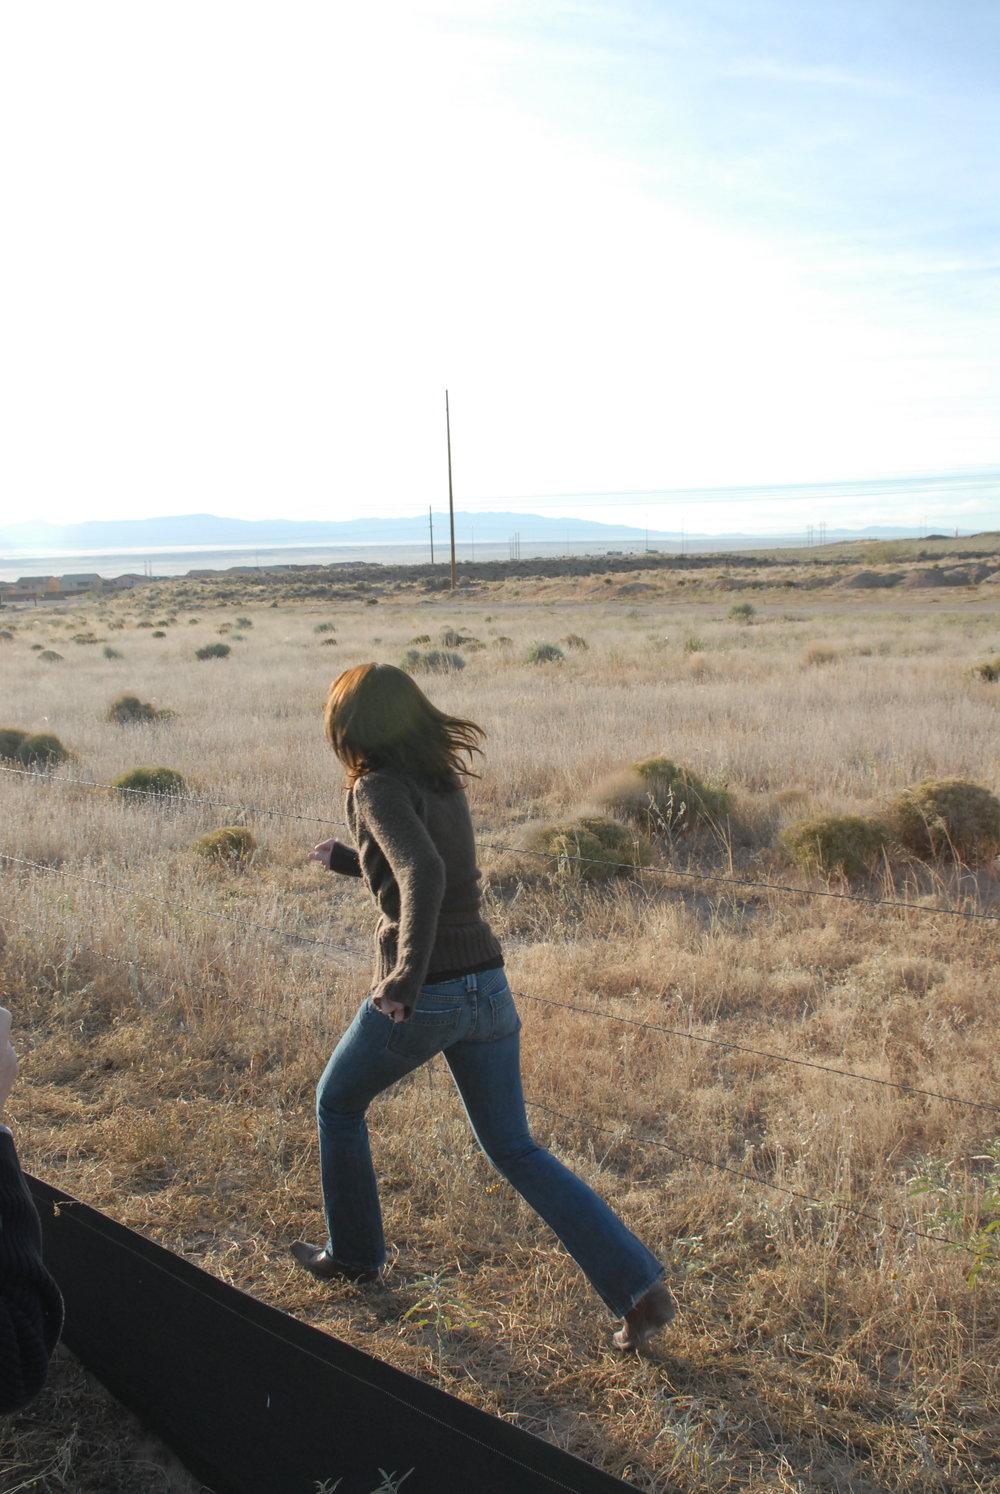 brian desert photos #3 035.jpg